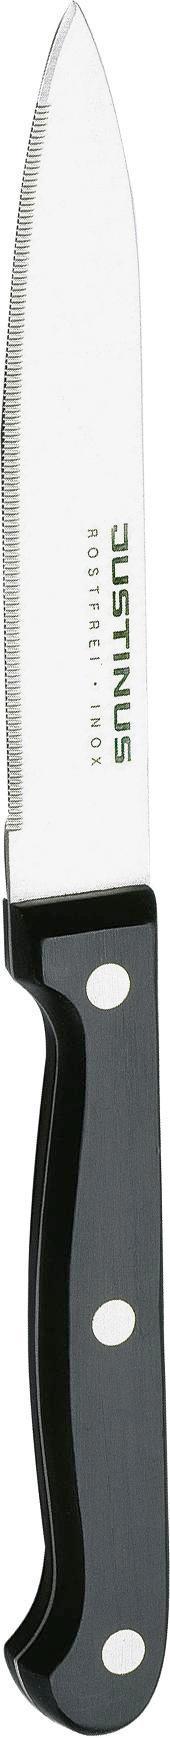 TOMATENMESSER   21 cm - Silberfarben/Schwarz, Basics, Kunststoff/Metall (21cm) - JUSTINUS